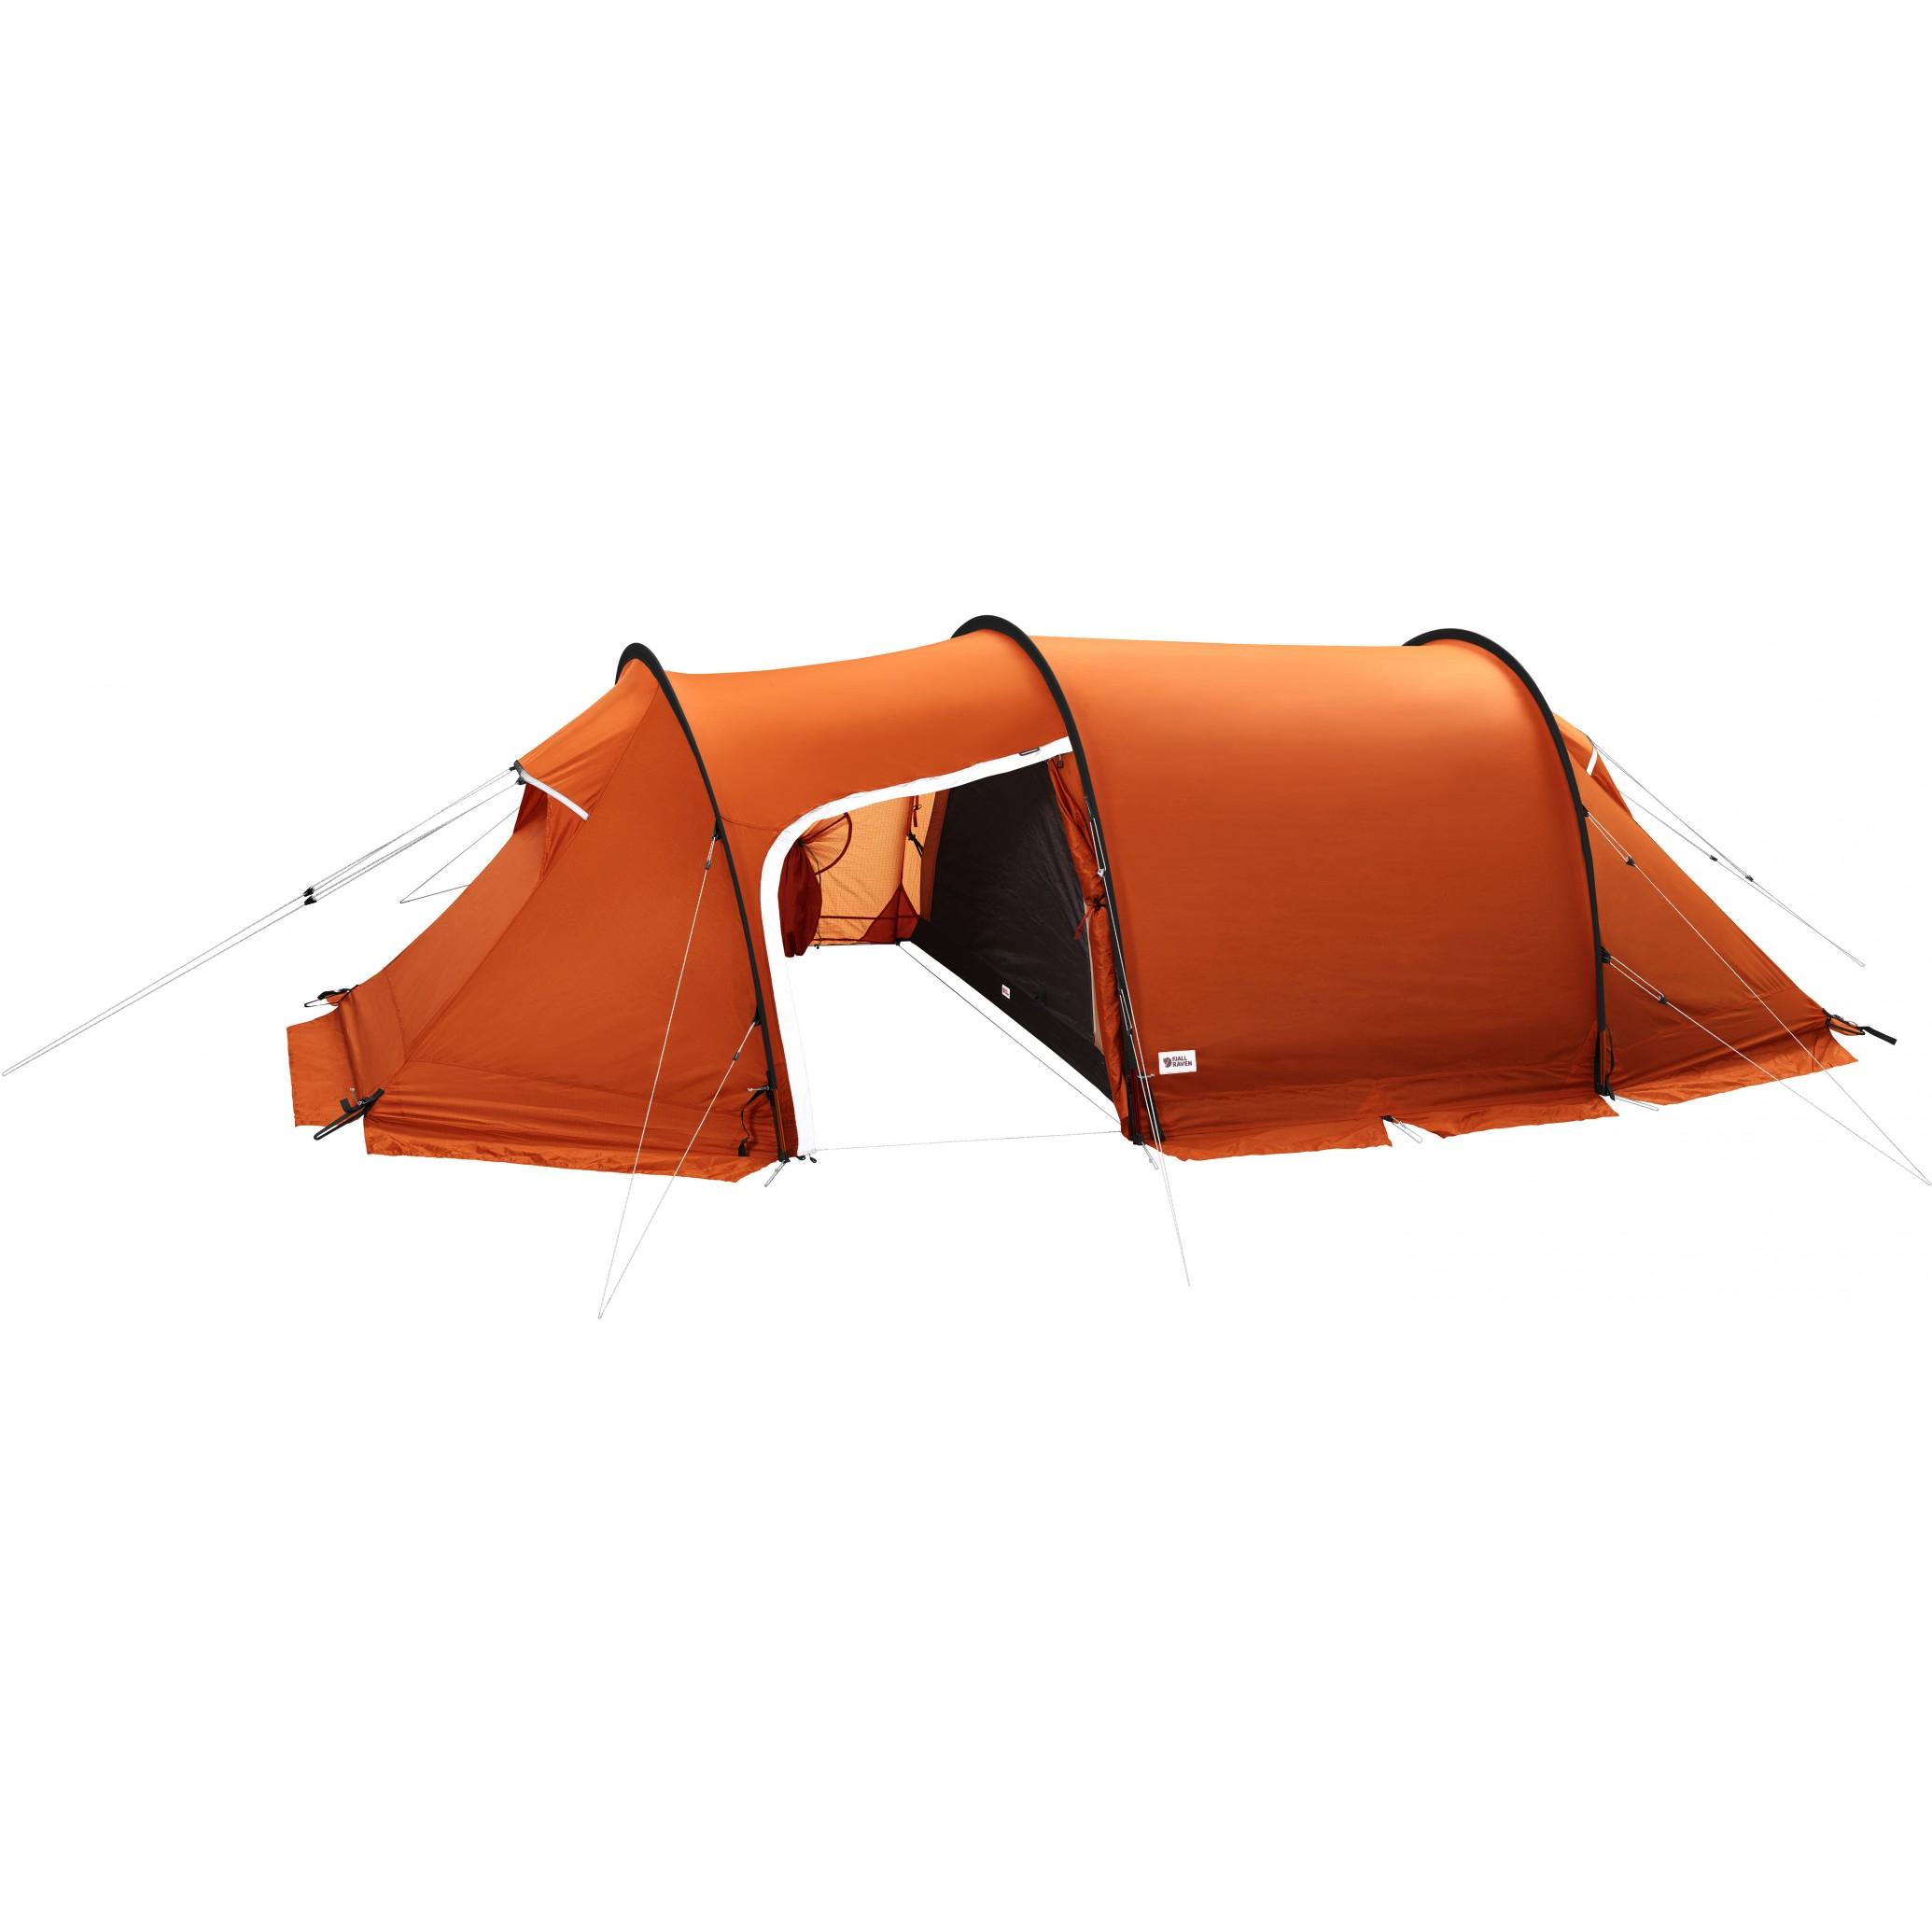 Fjellreven Polar Endurance 3 Telt hos Fjellrevenshop.no